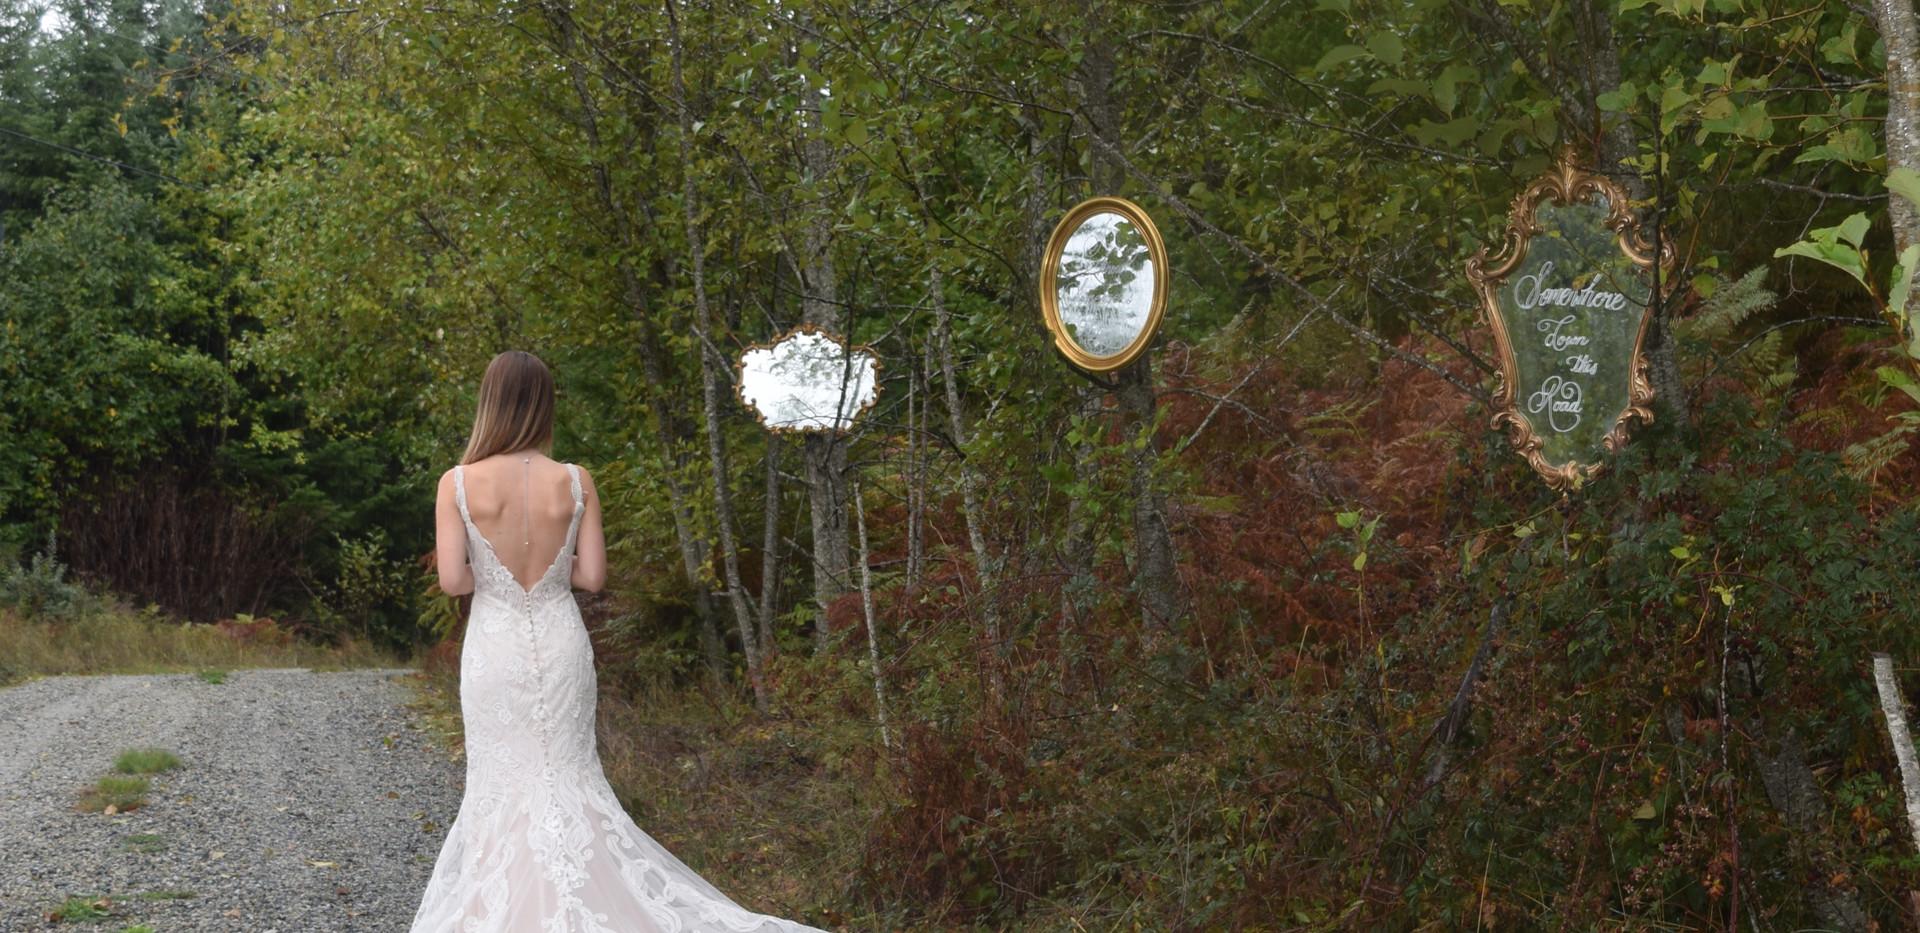 Anastasia mirror pathway